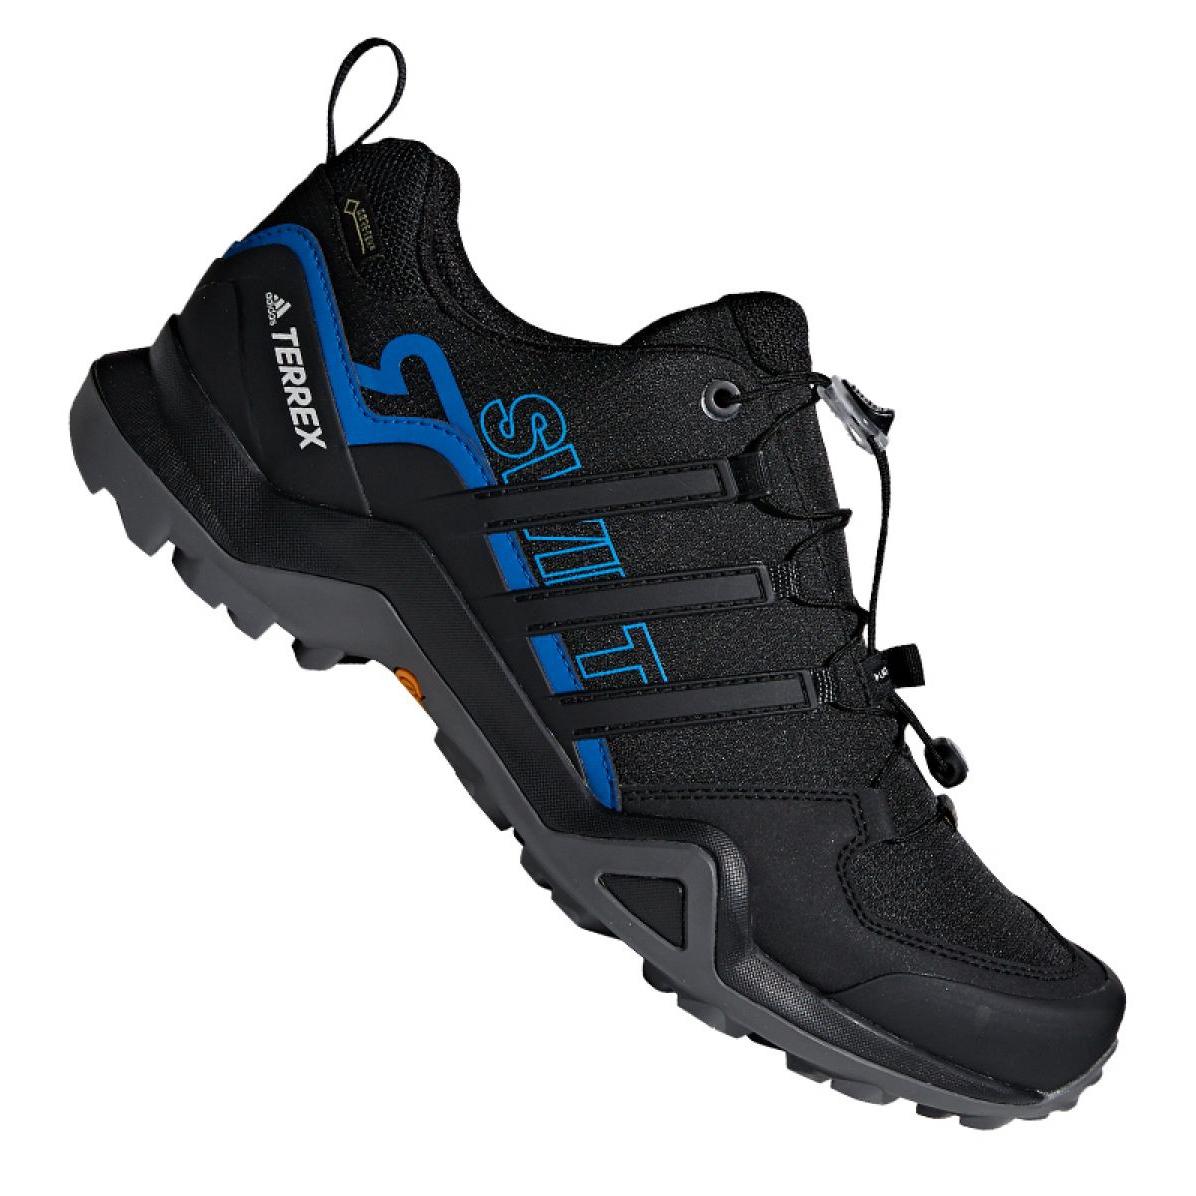 pretty nice dcd37 0847f Black Trekking shoes adidas Terrex Swift R2 Gtx M AC7829